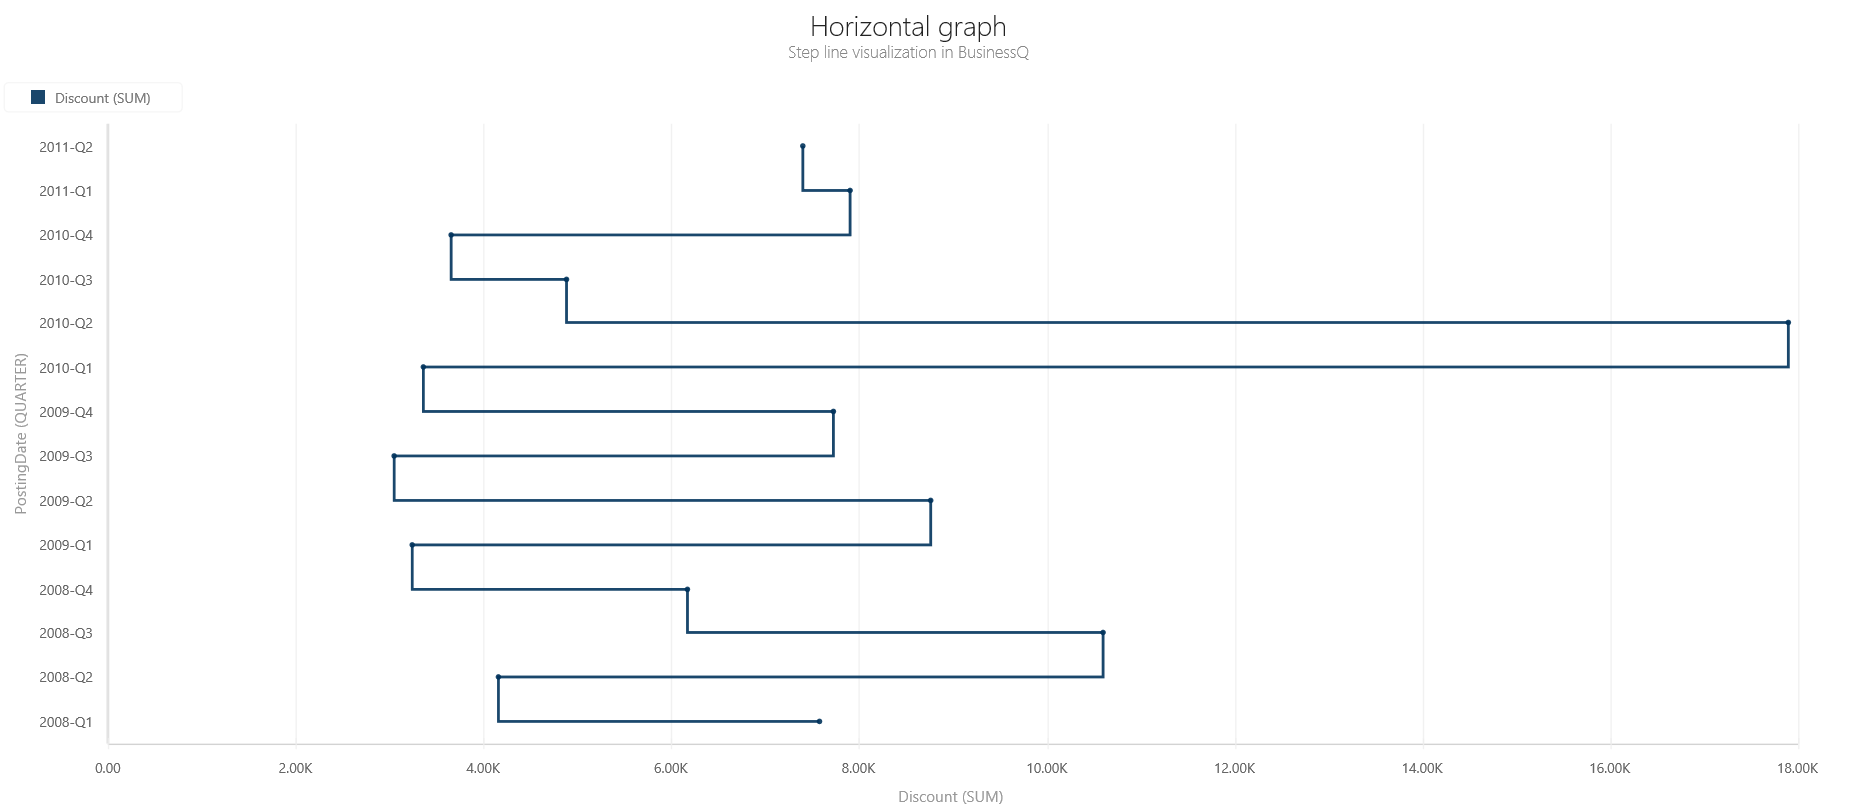 BQ_Horizontal_graph_1_Horizontal_Step_line